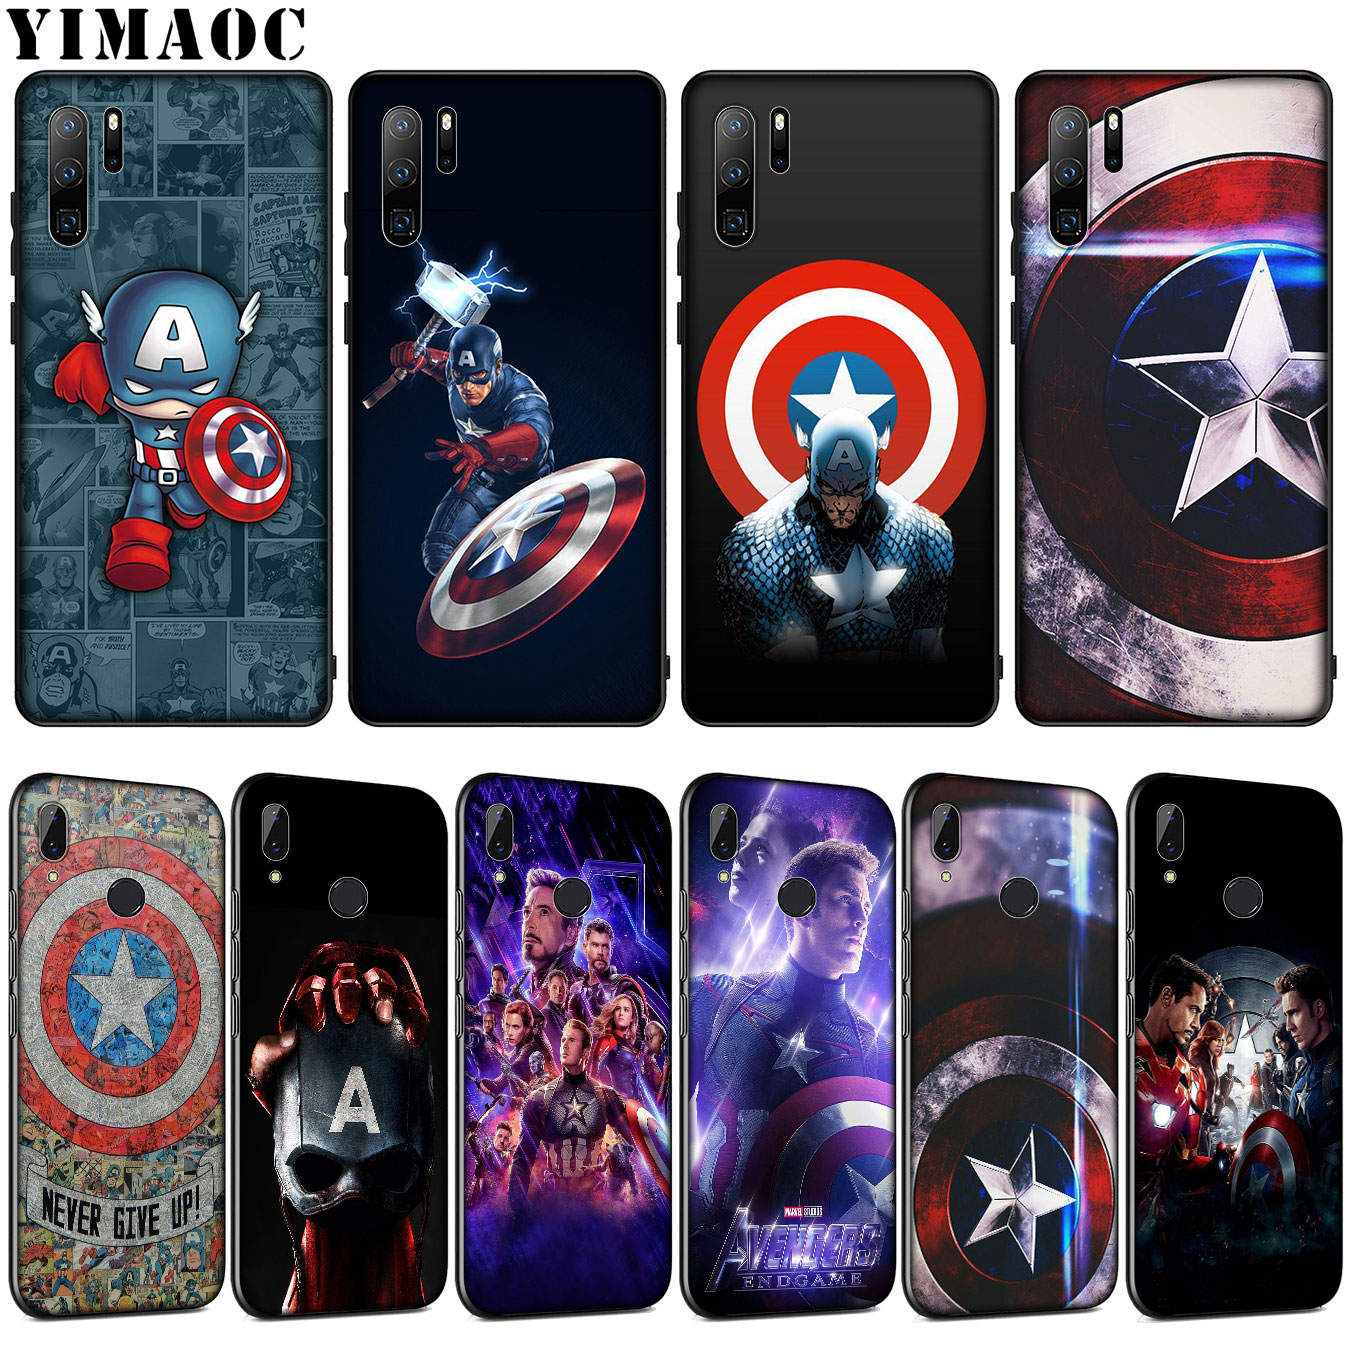 Мягкий силиконовый чехол YIMAOC Marvel Captain America shield для Huawei P30 P20 Pro P10 P9 Lite Mini 2017 2016 Cover P Smart Z 2019